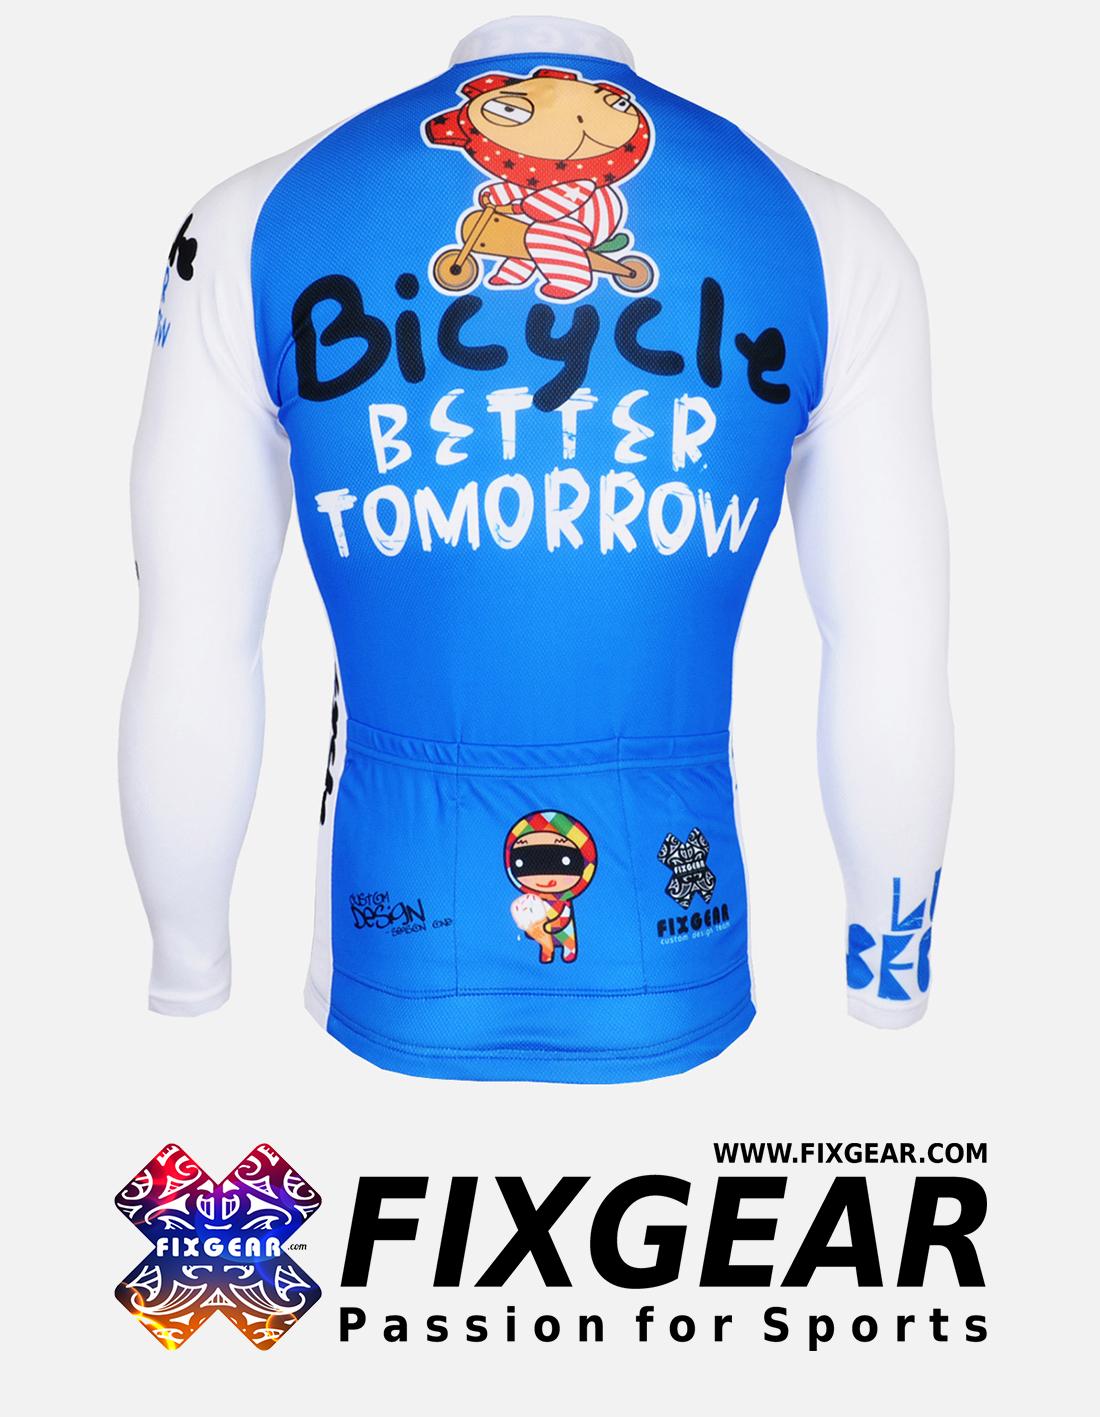 FIXGEAR CS-31B1 Men's Cycling  Jersey Long Sleeve